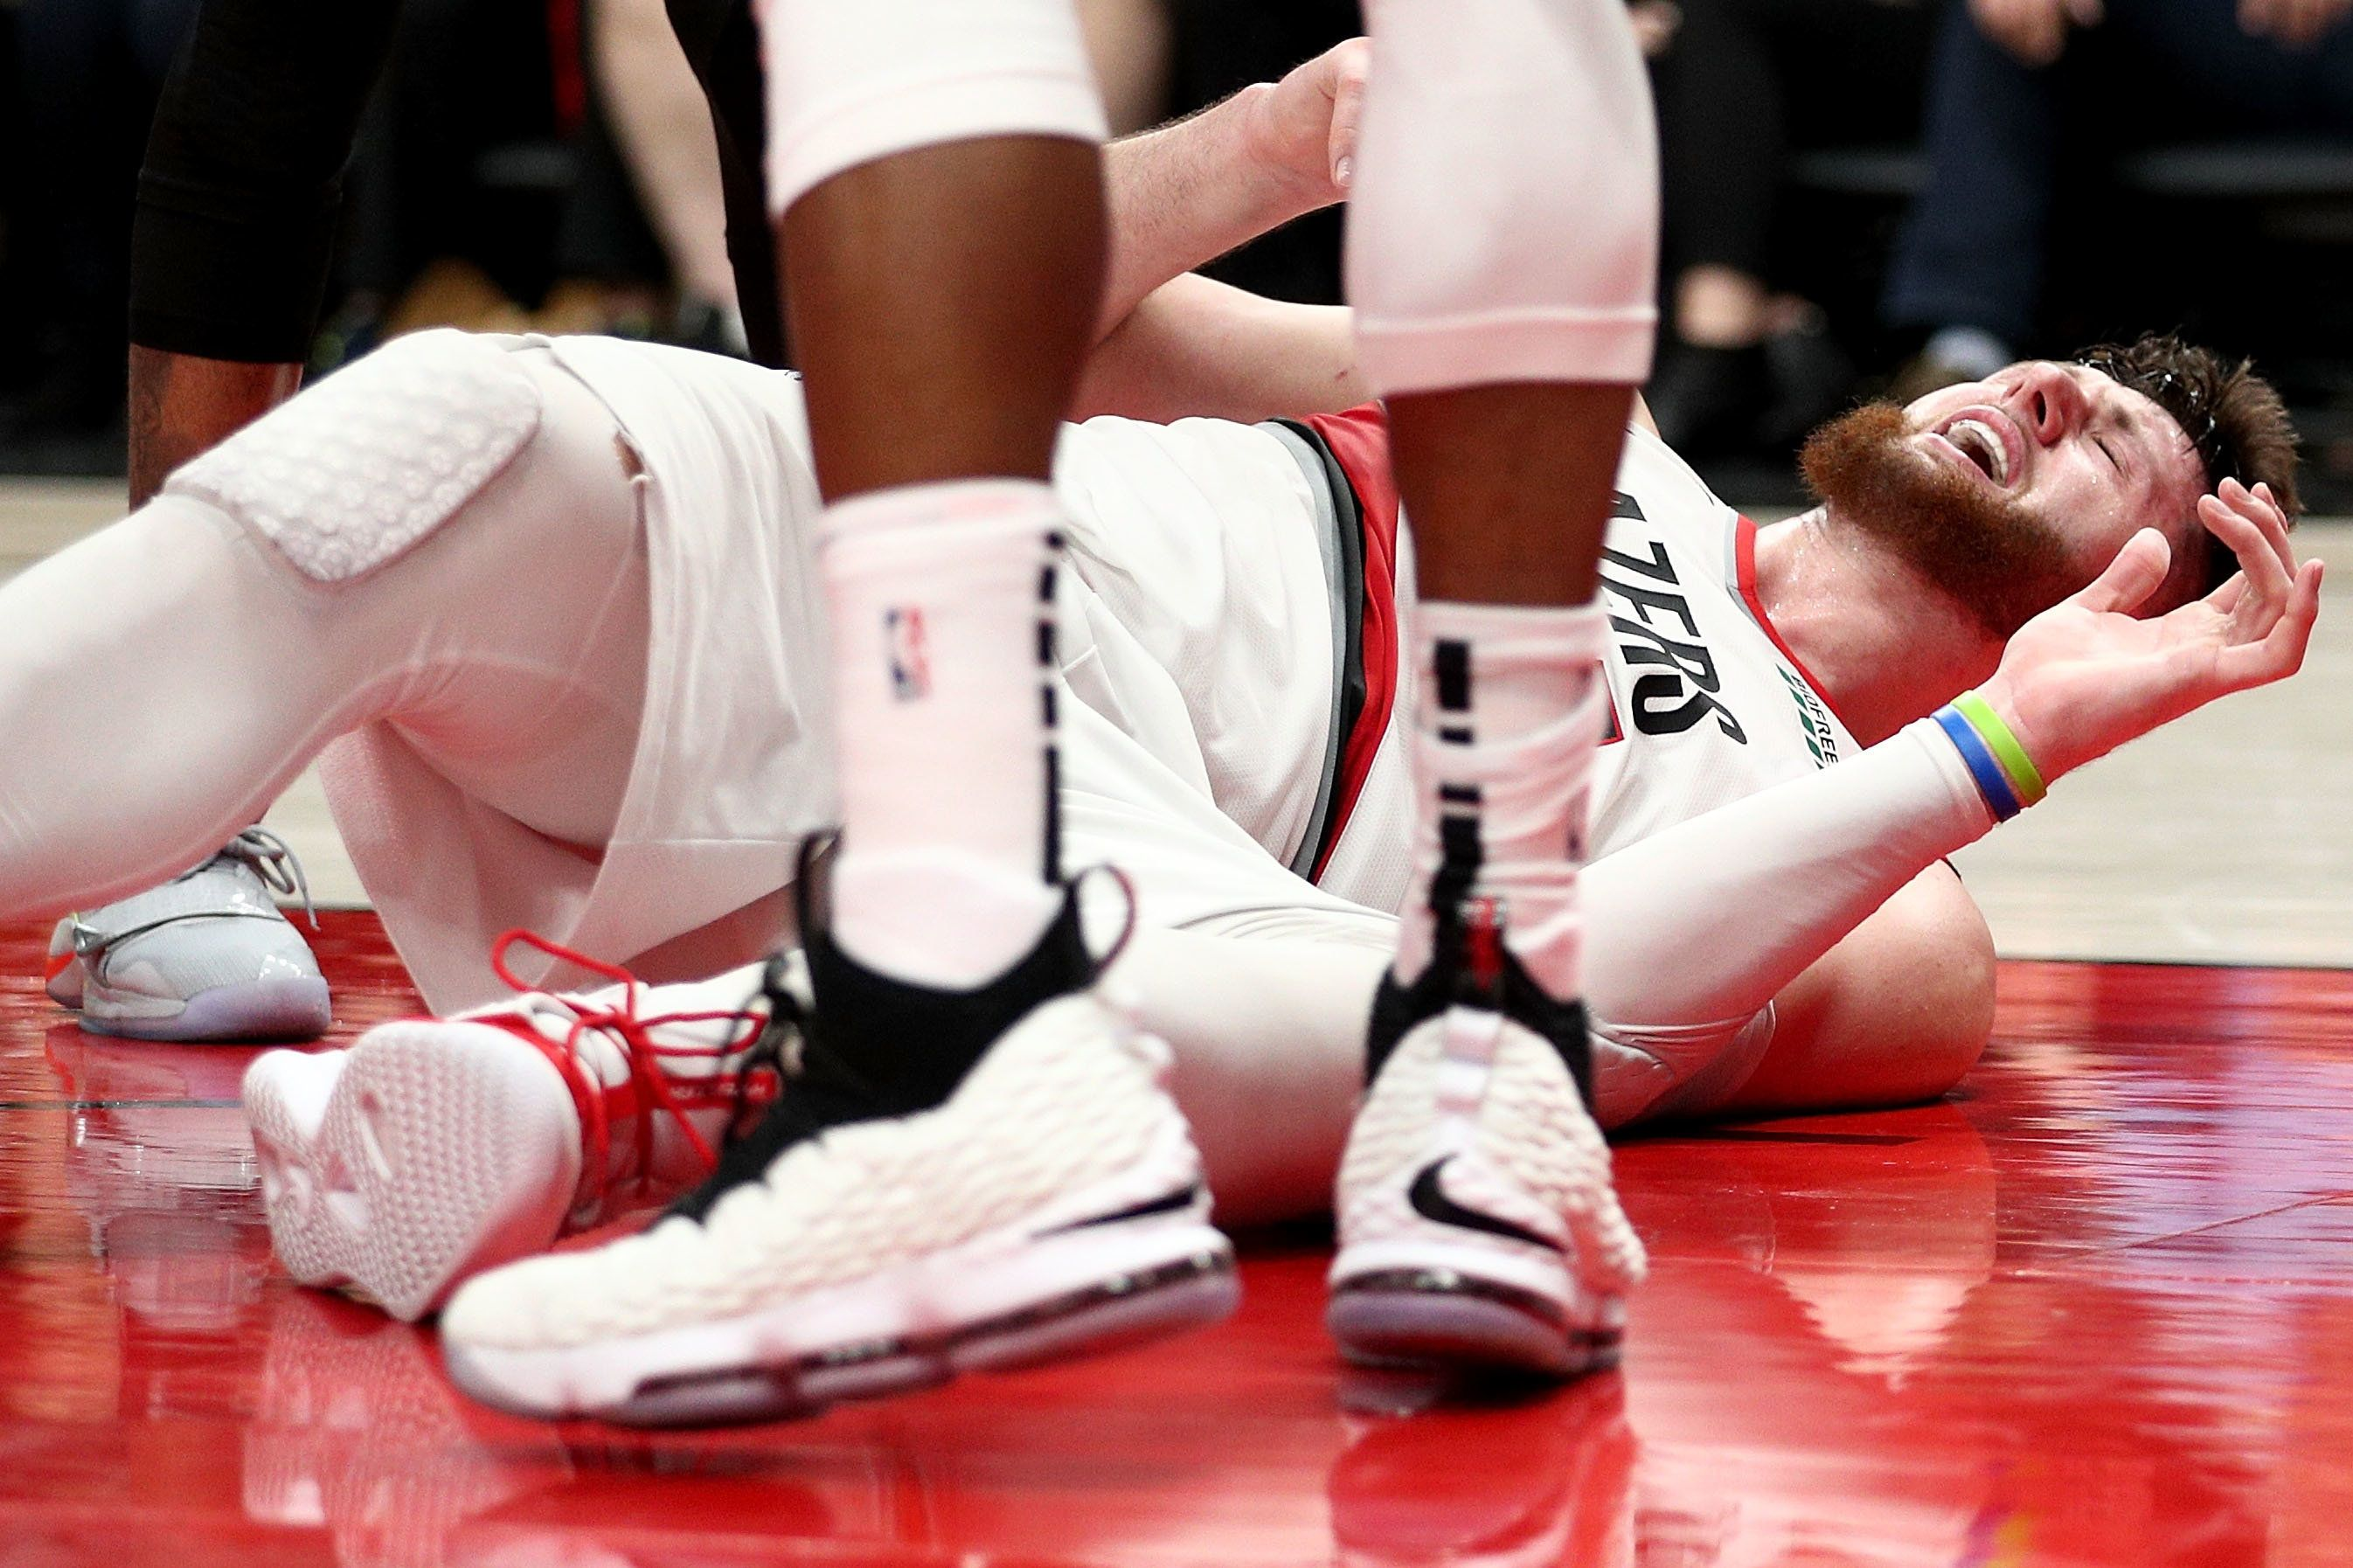 GRAPHIC VIDEO: NBA Star Jusuf Nurkic Suffers Horrific Injury On Live